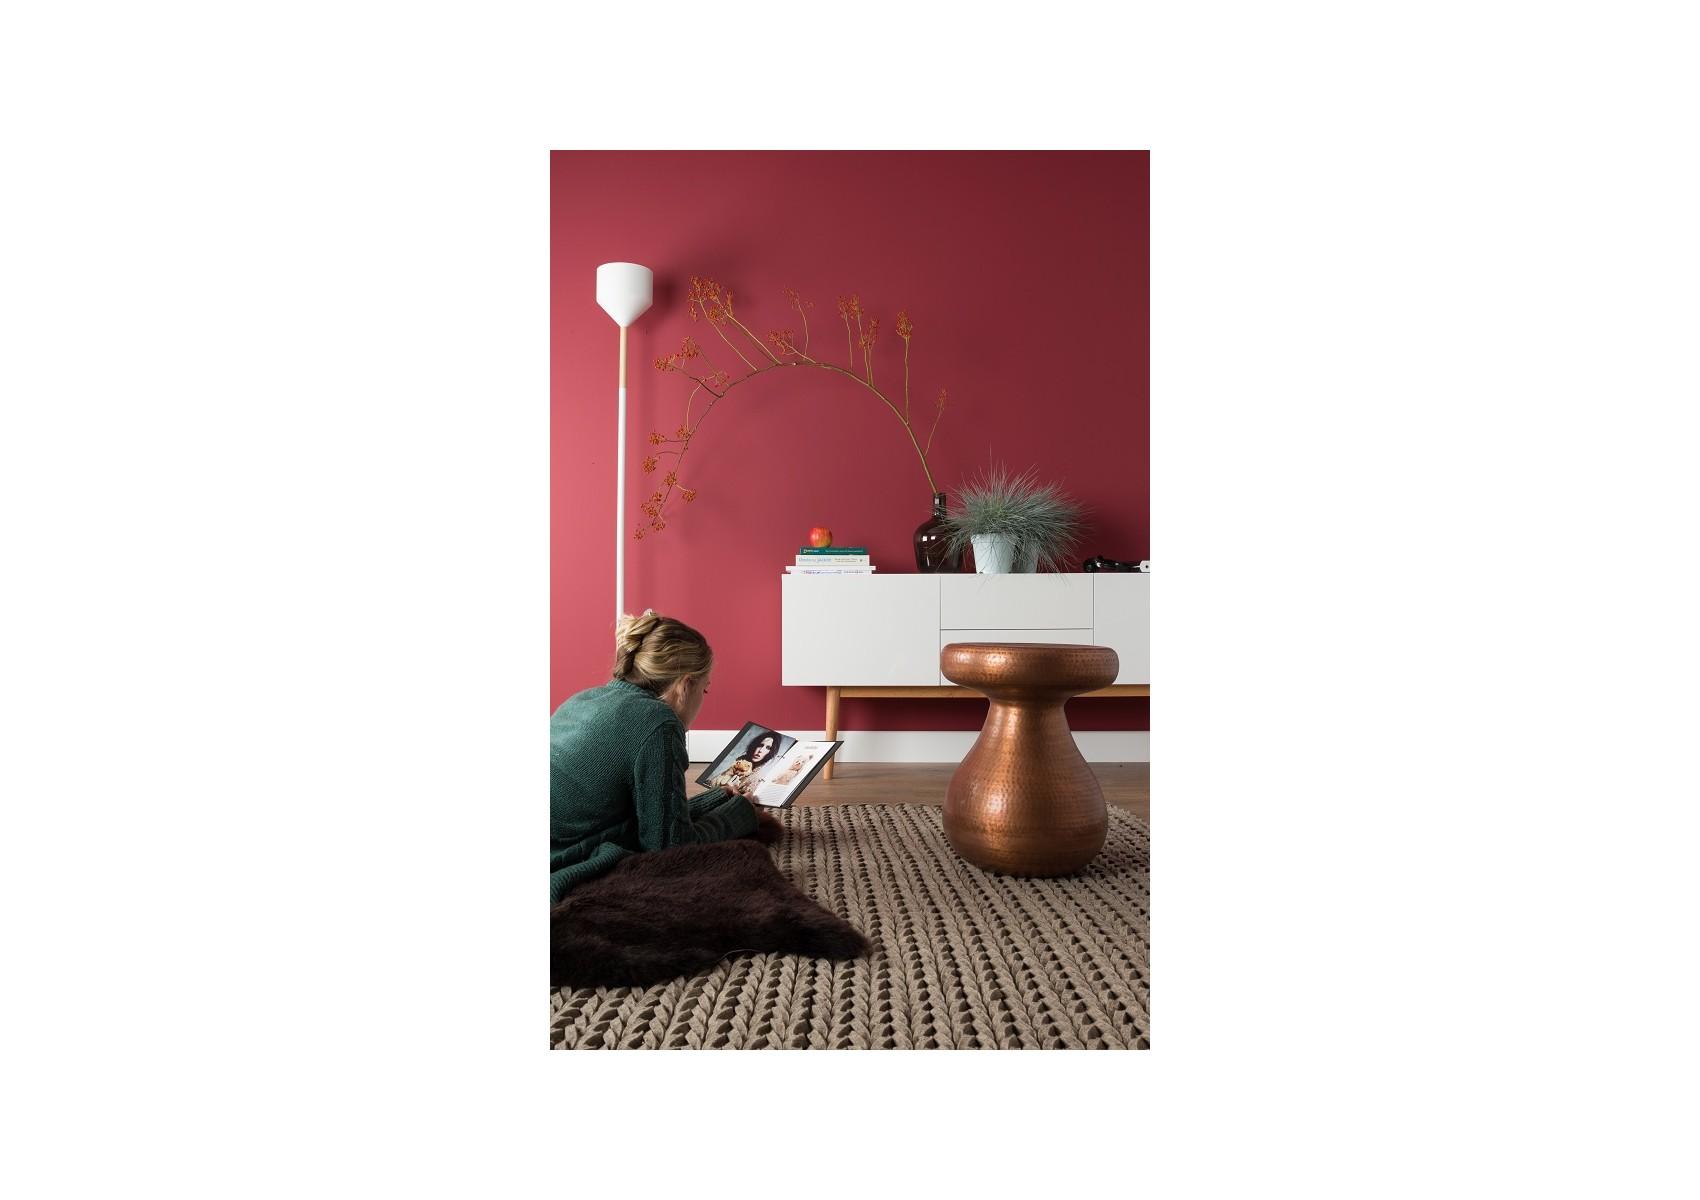 Carrelage Design u00bb La Boite A Tapis - Moderne Design pour ...